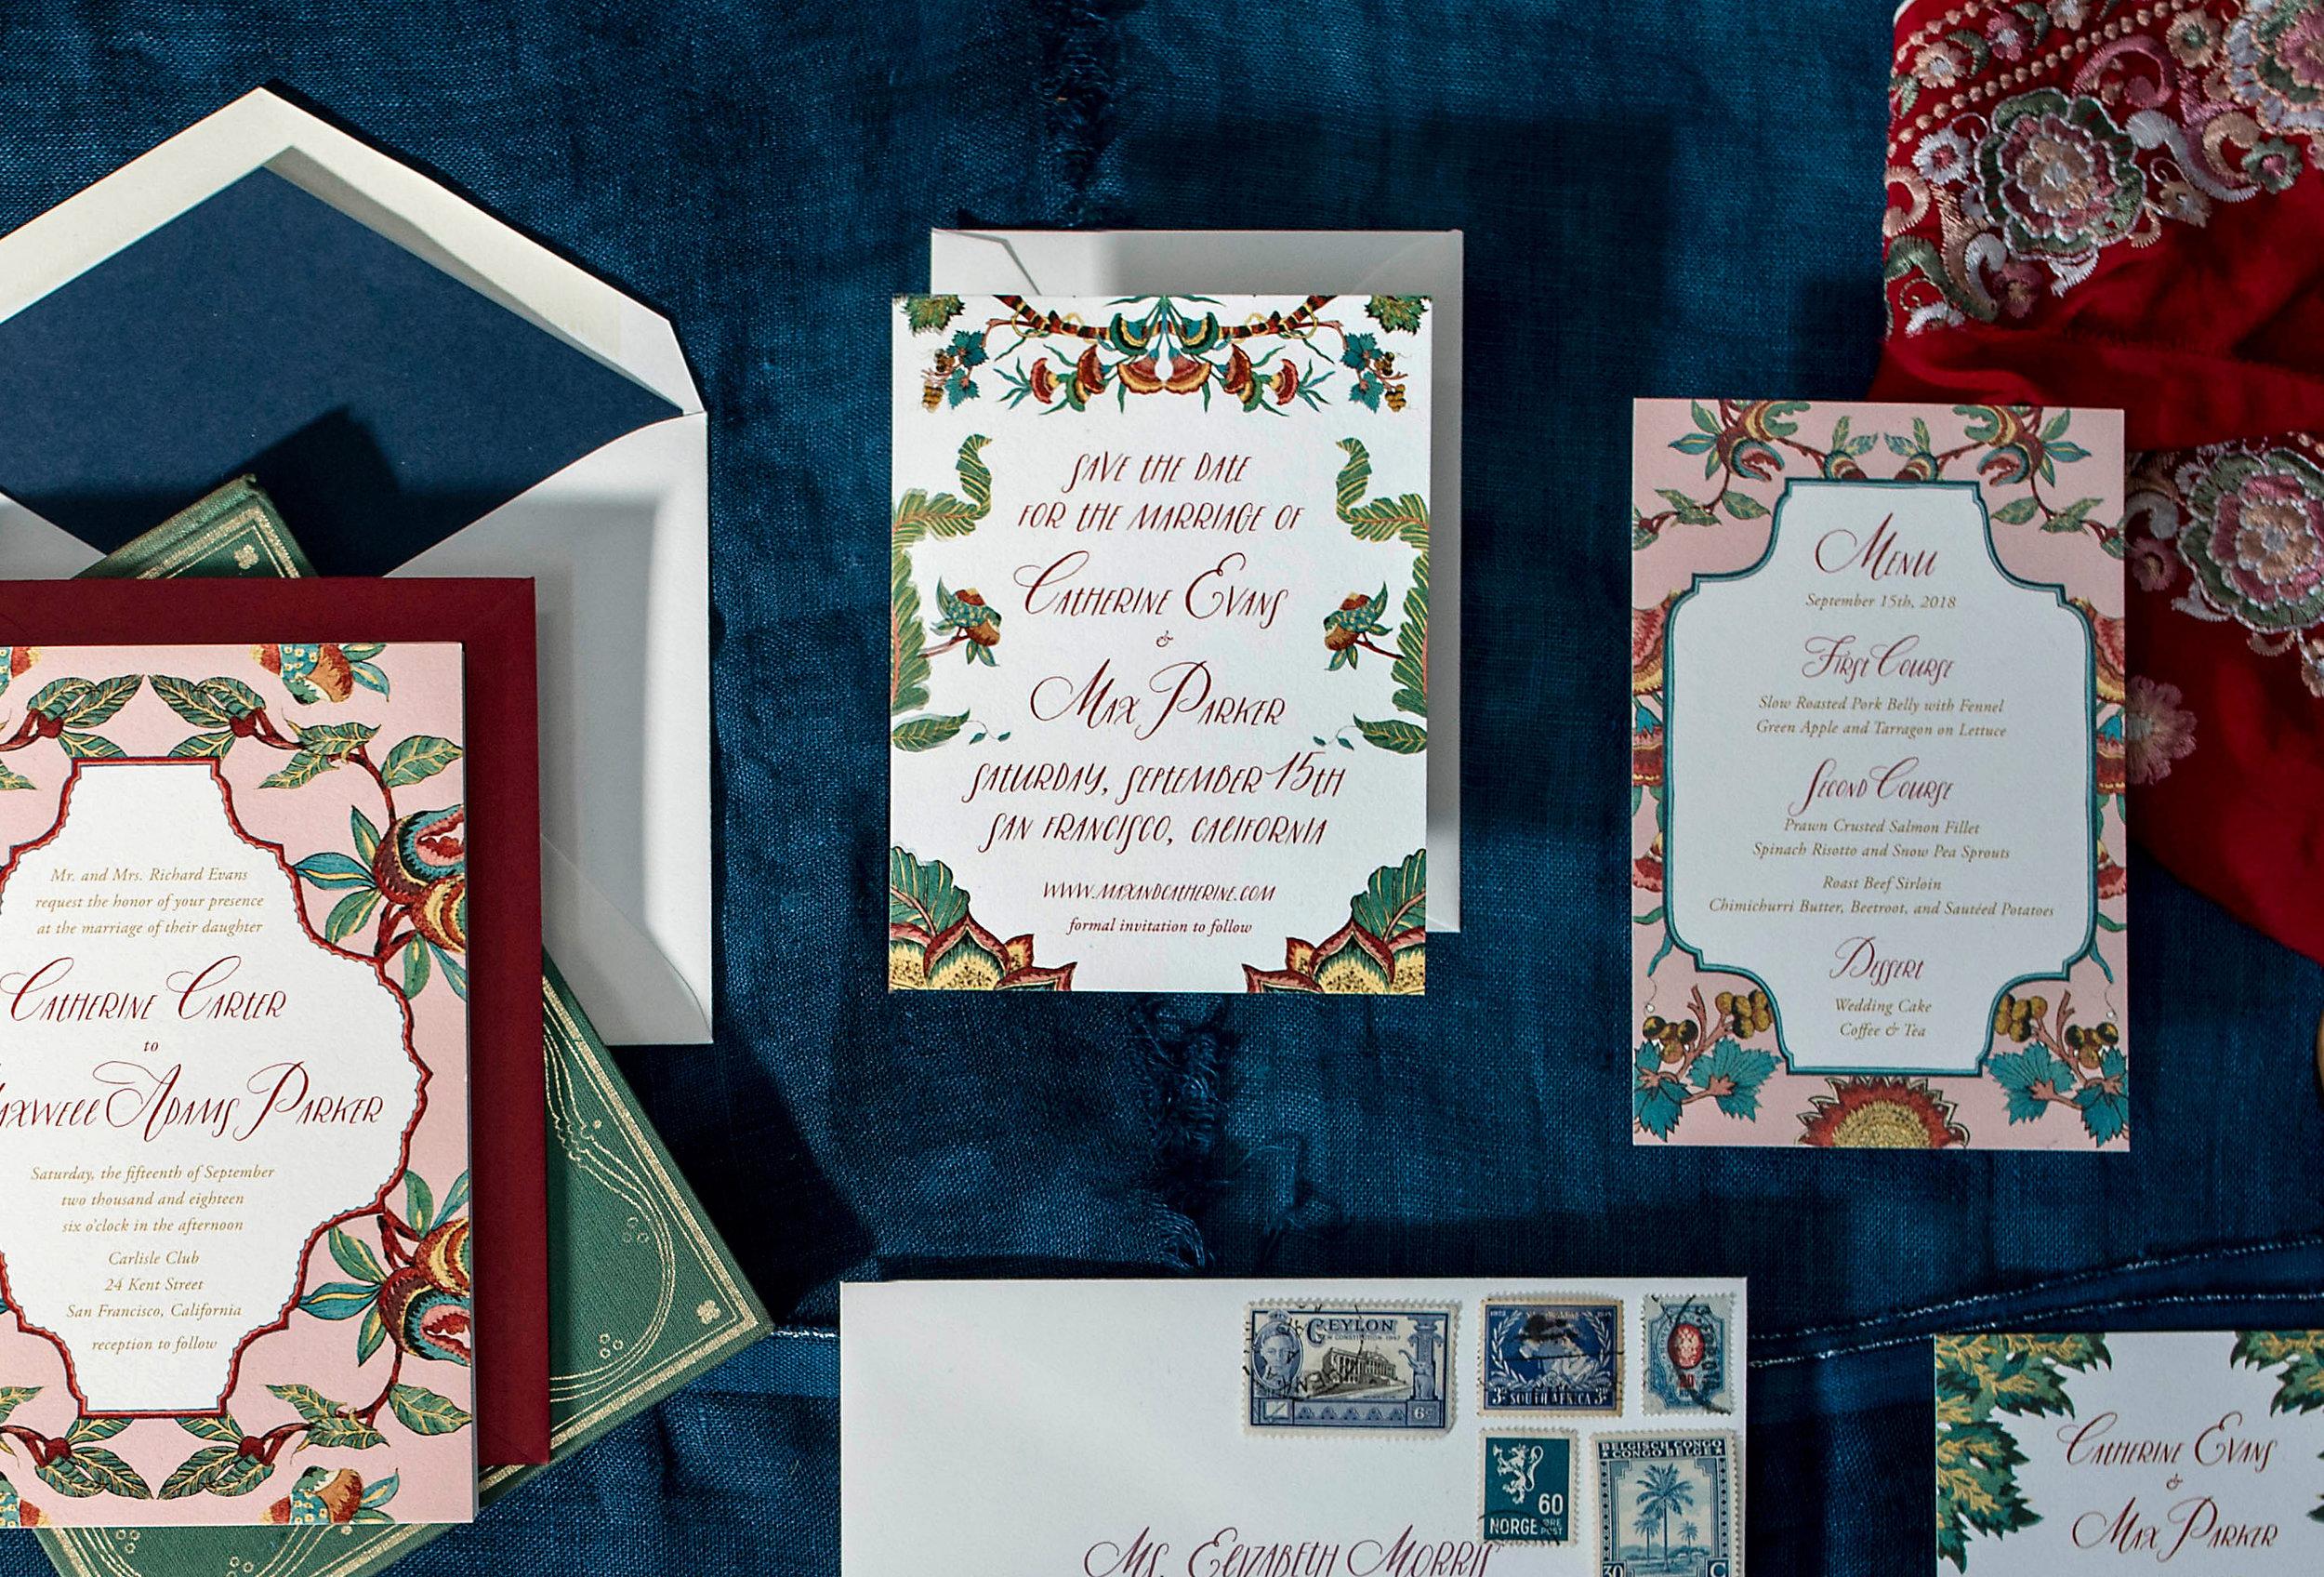 mamaycrop3-bright-unique-vintage-wedding-invitations-hellotenfold-329.jpg